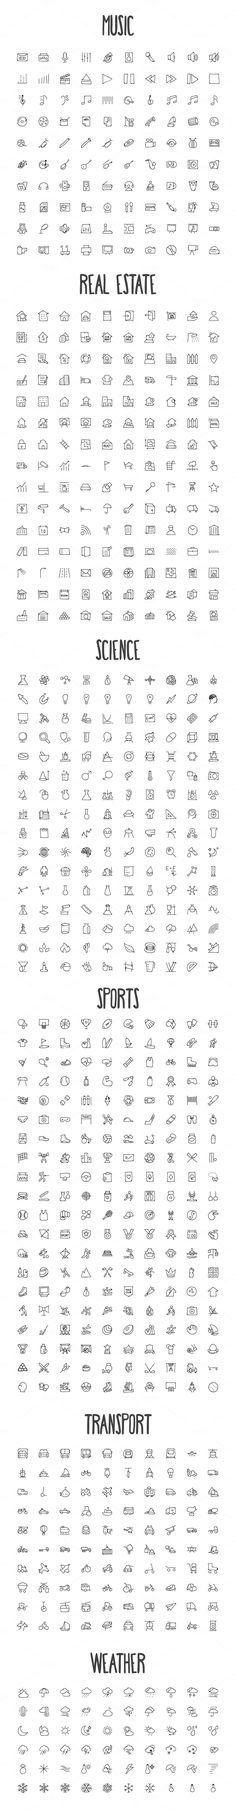 2440 Hand Drawn Doodle Icons Bundle